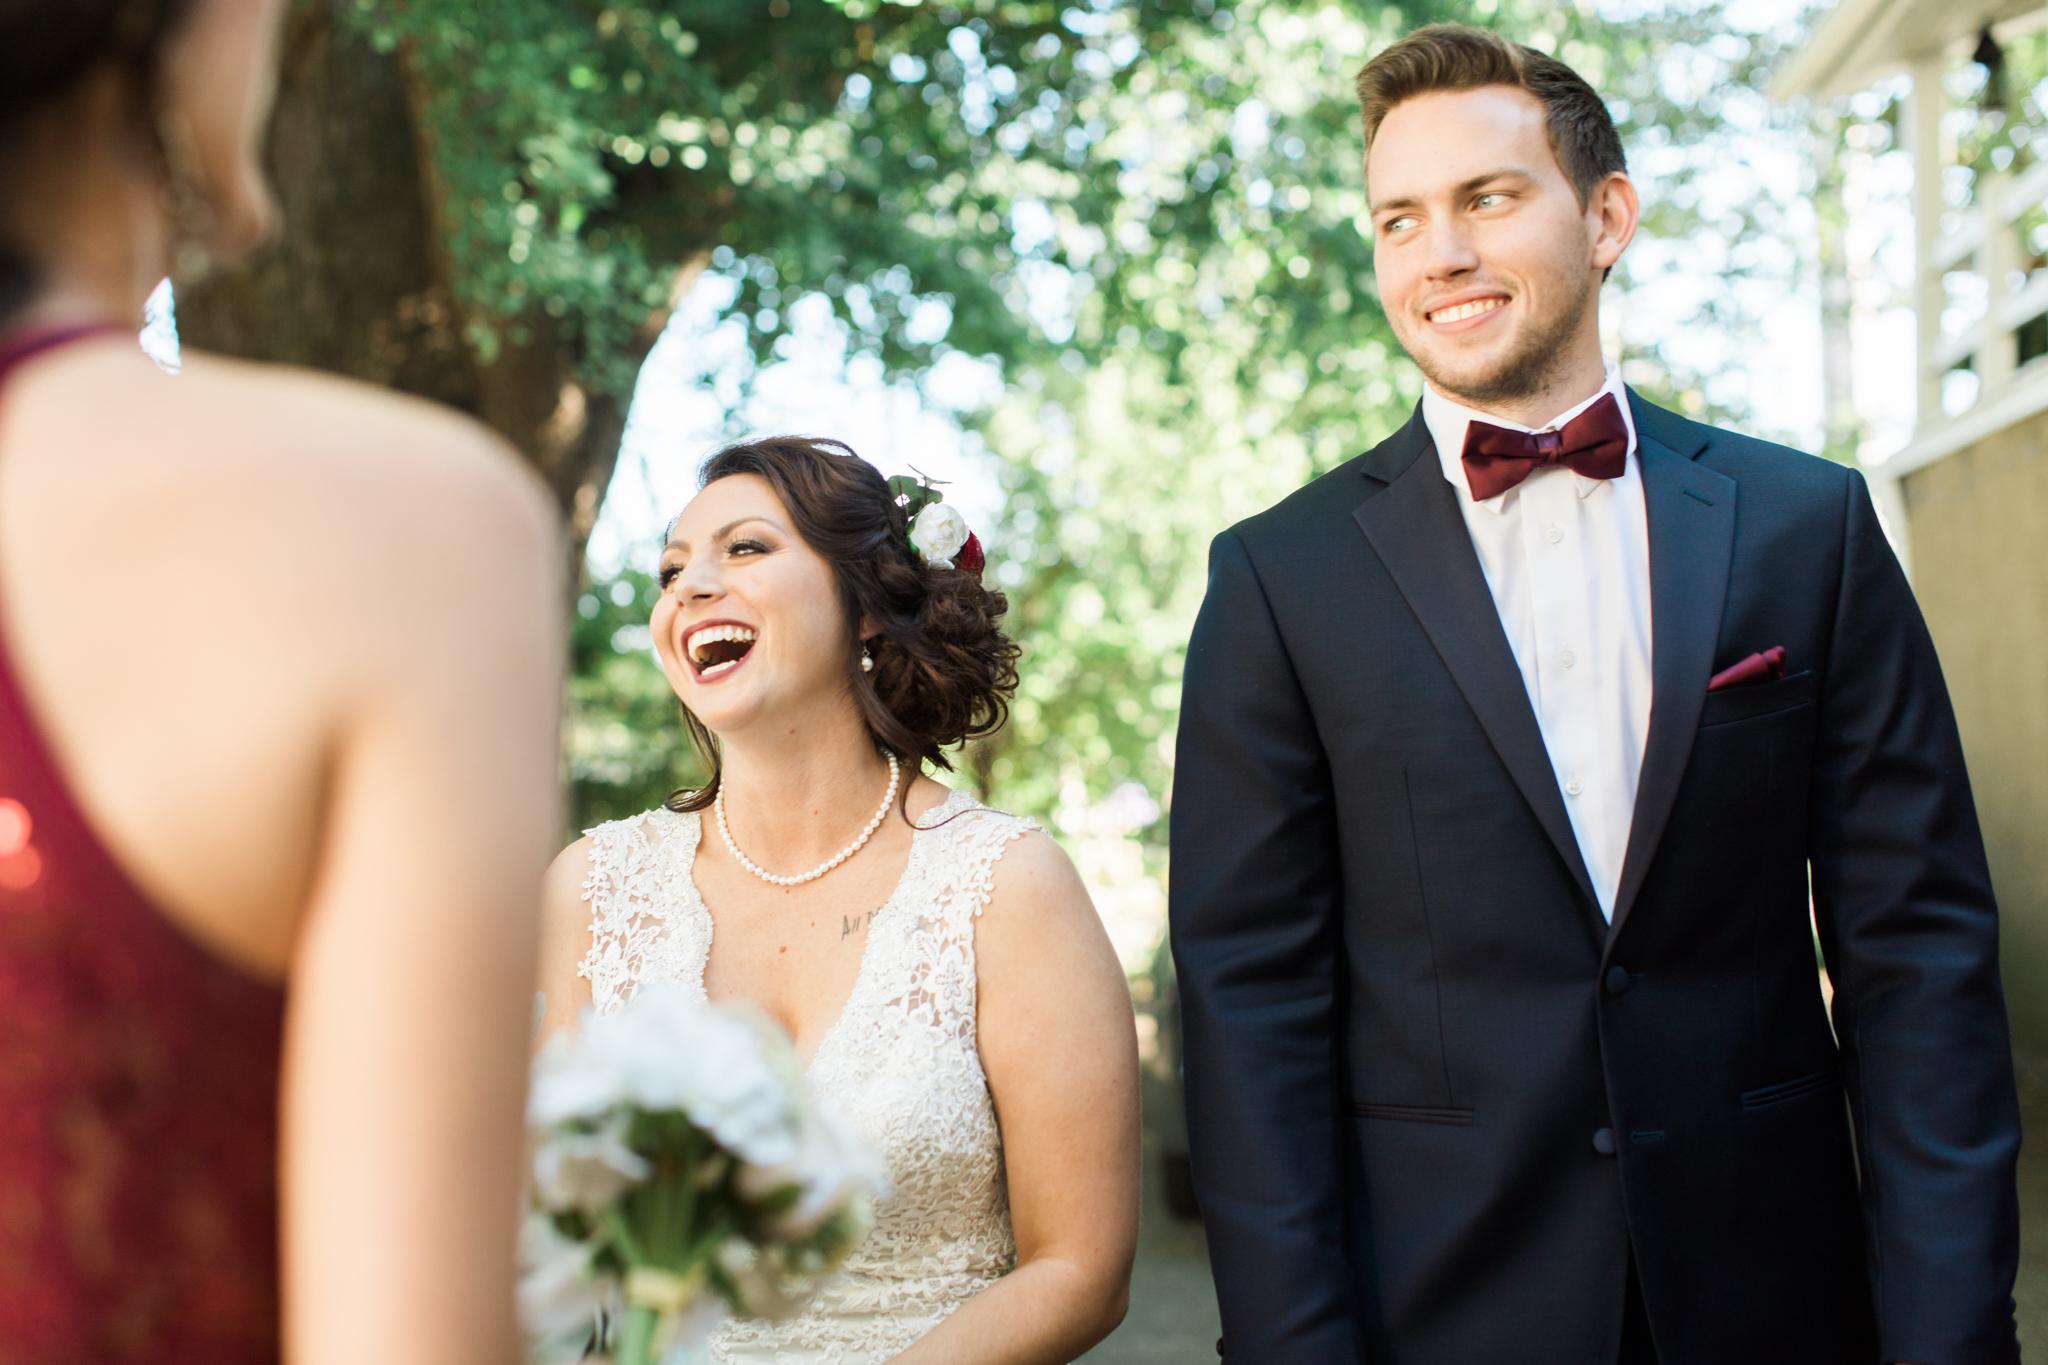 Austin_Kori_Peterson_Dumensnil_House_Louisville_Wedding (20 of 25).jpg